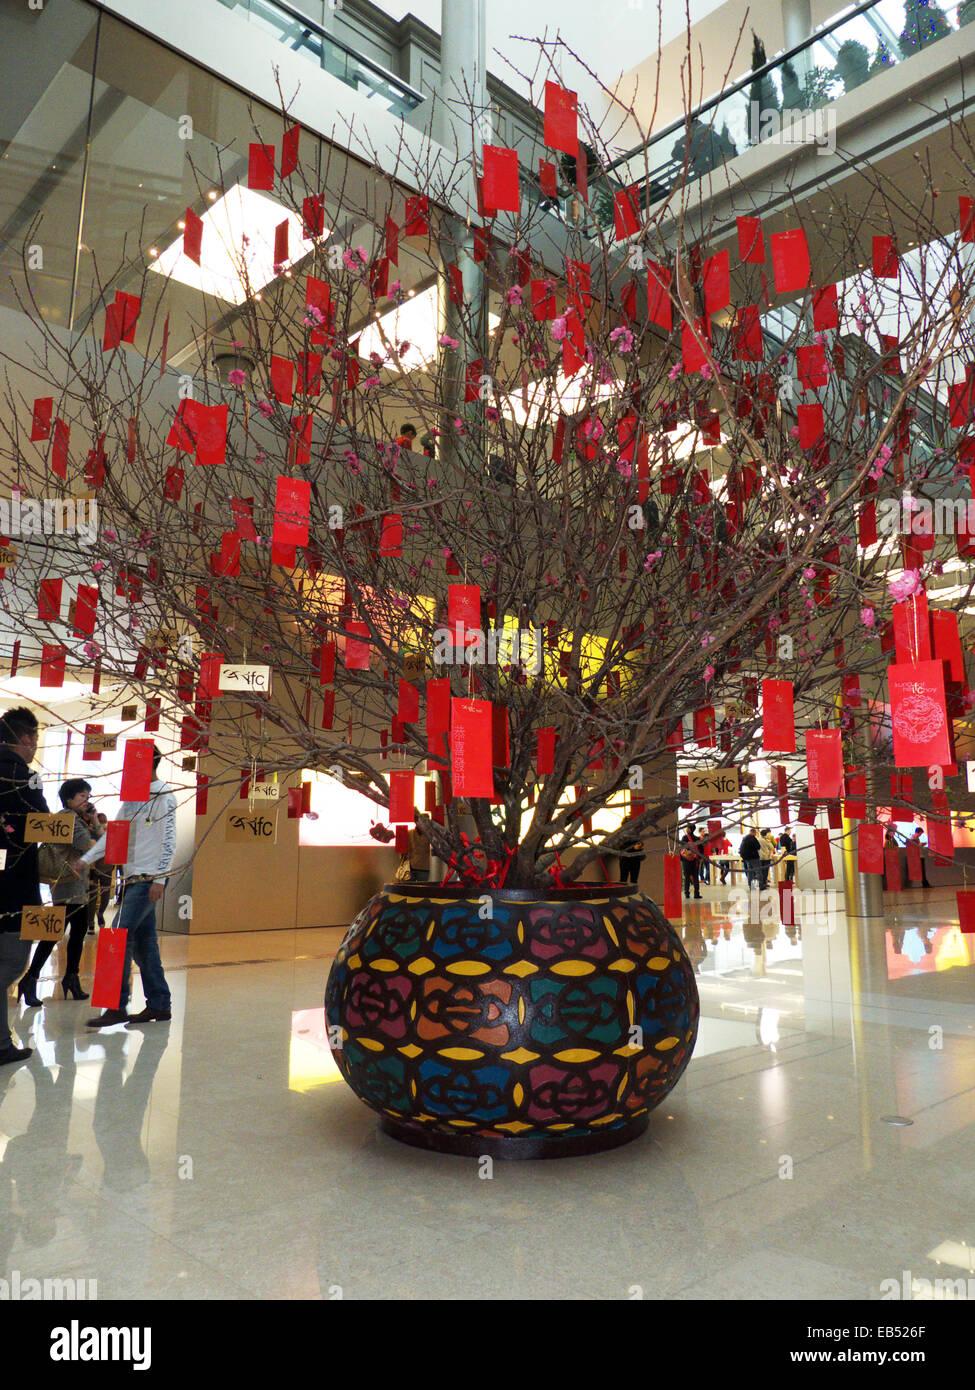 China Hong Kong Chinese Lunar New Year decoration in ...